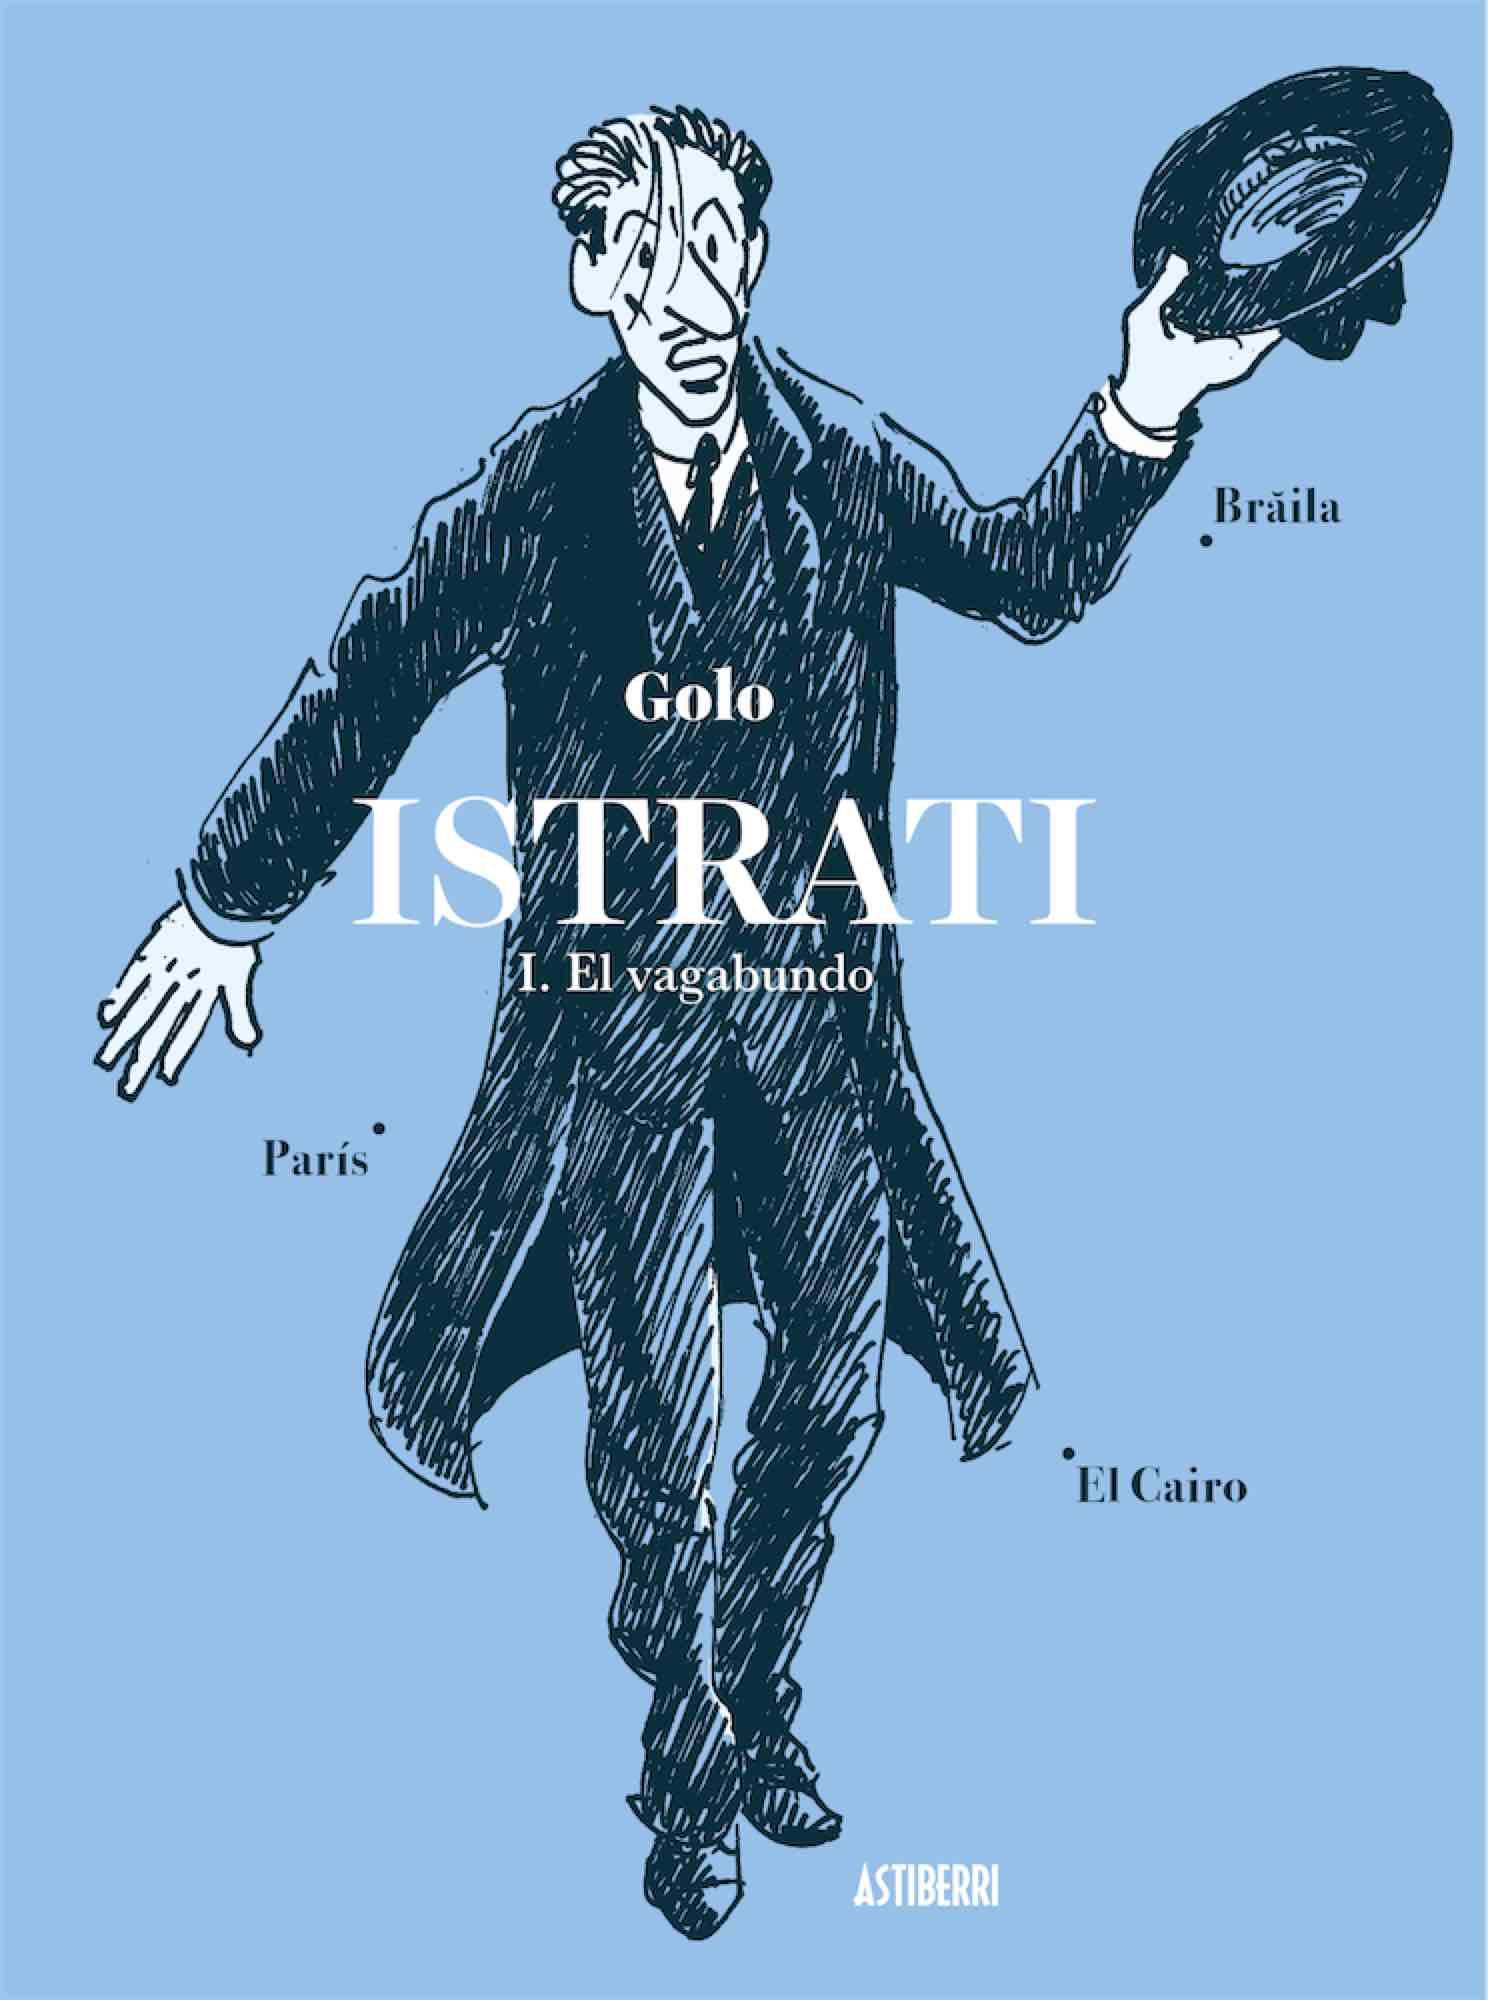 Resultado de imagen de Istrati. El vagabundo. Astiberri